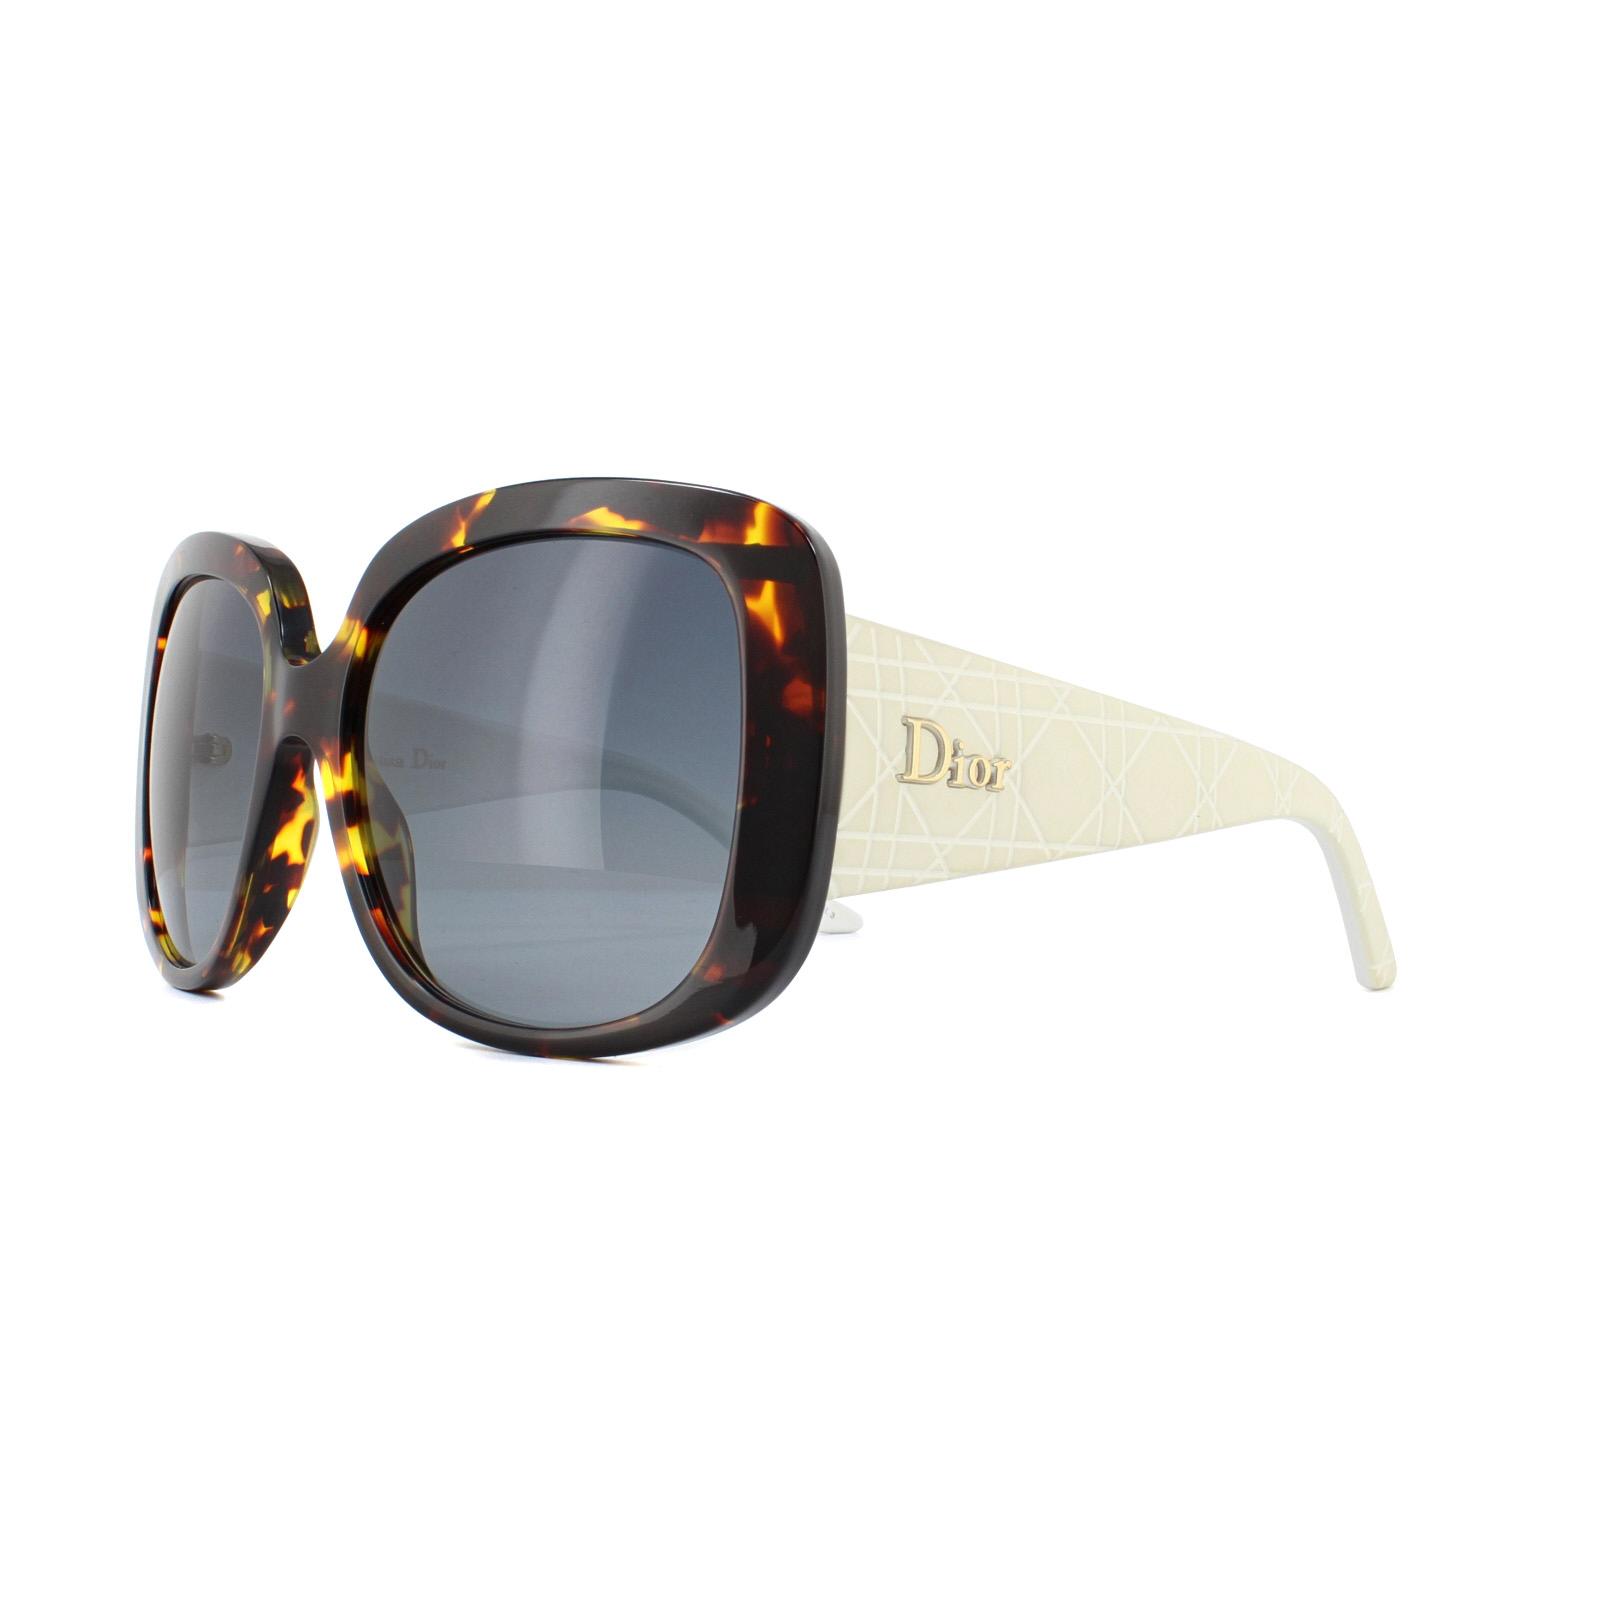 289f08e57159 Dior Sunglasses Dior Lady Lady1S 04I HD Havana White Grey Gradient ...